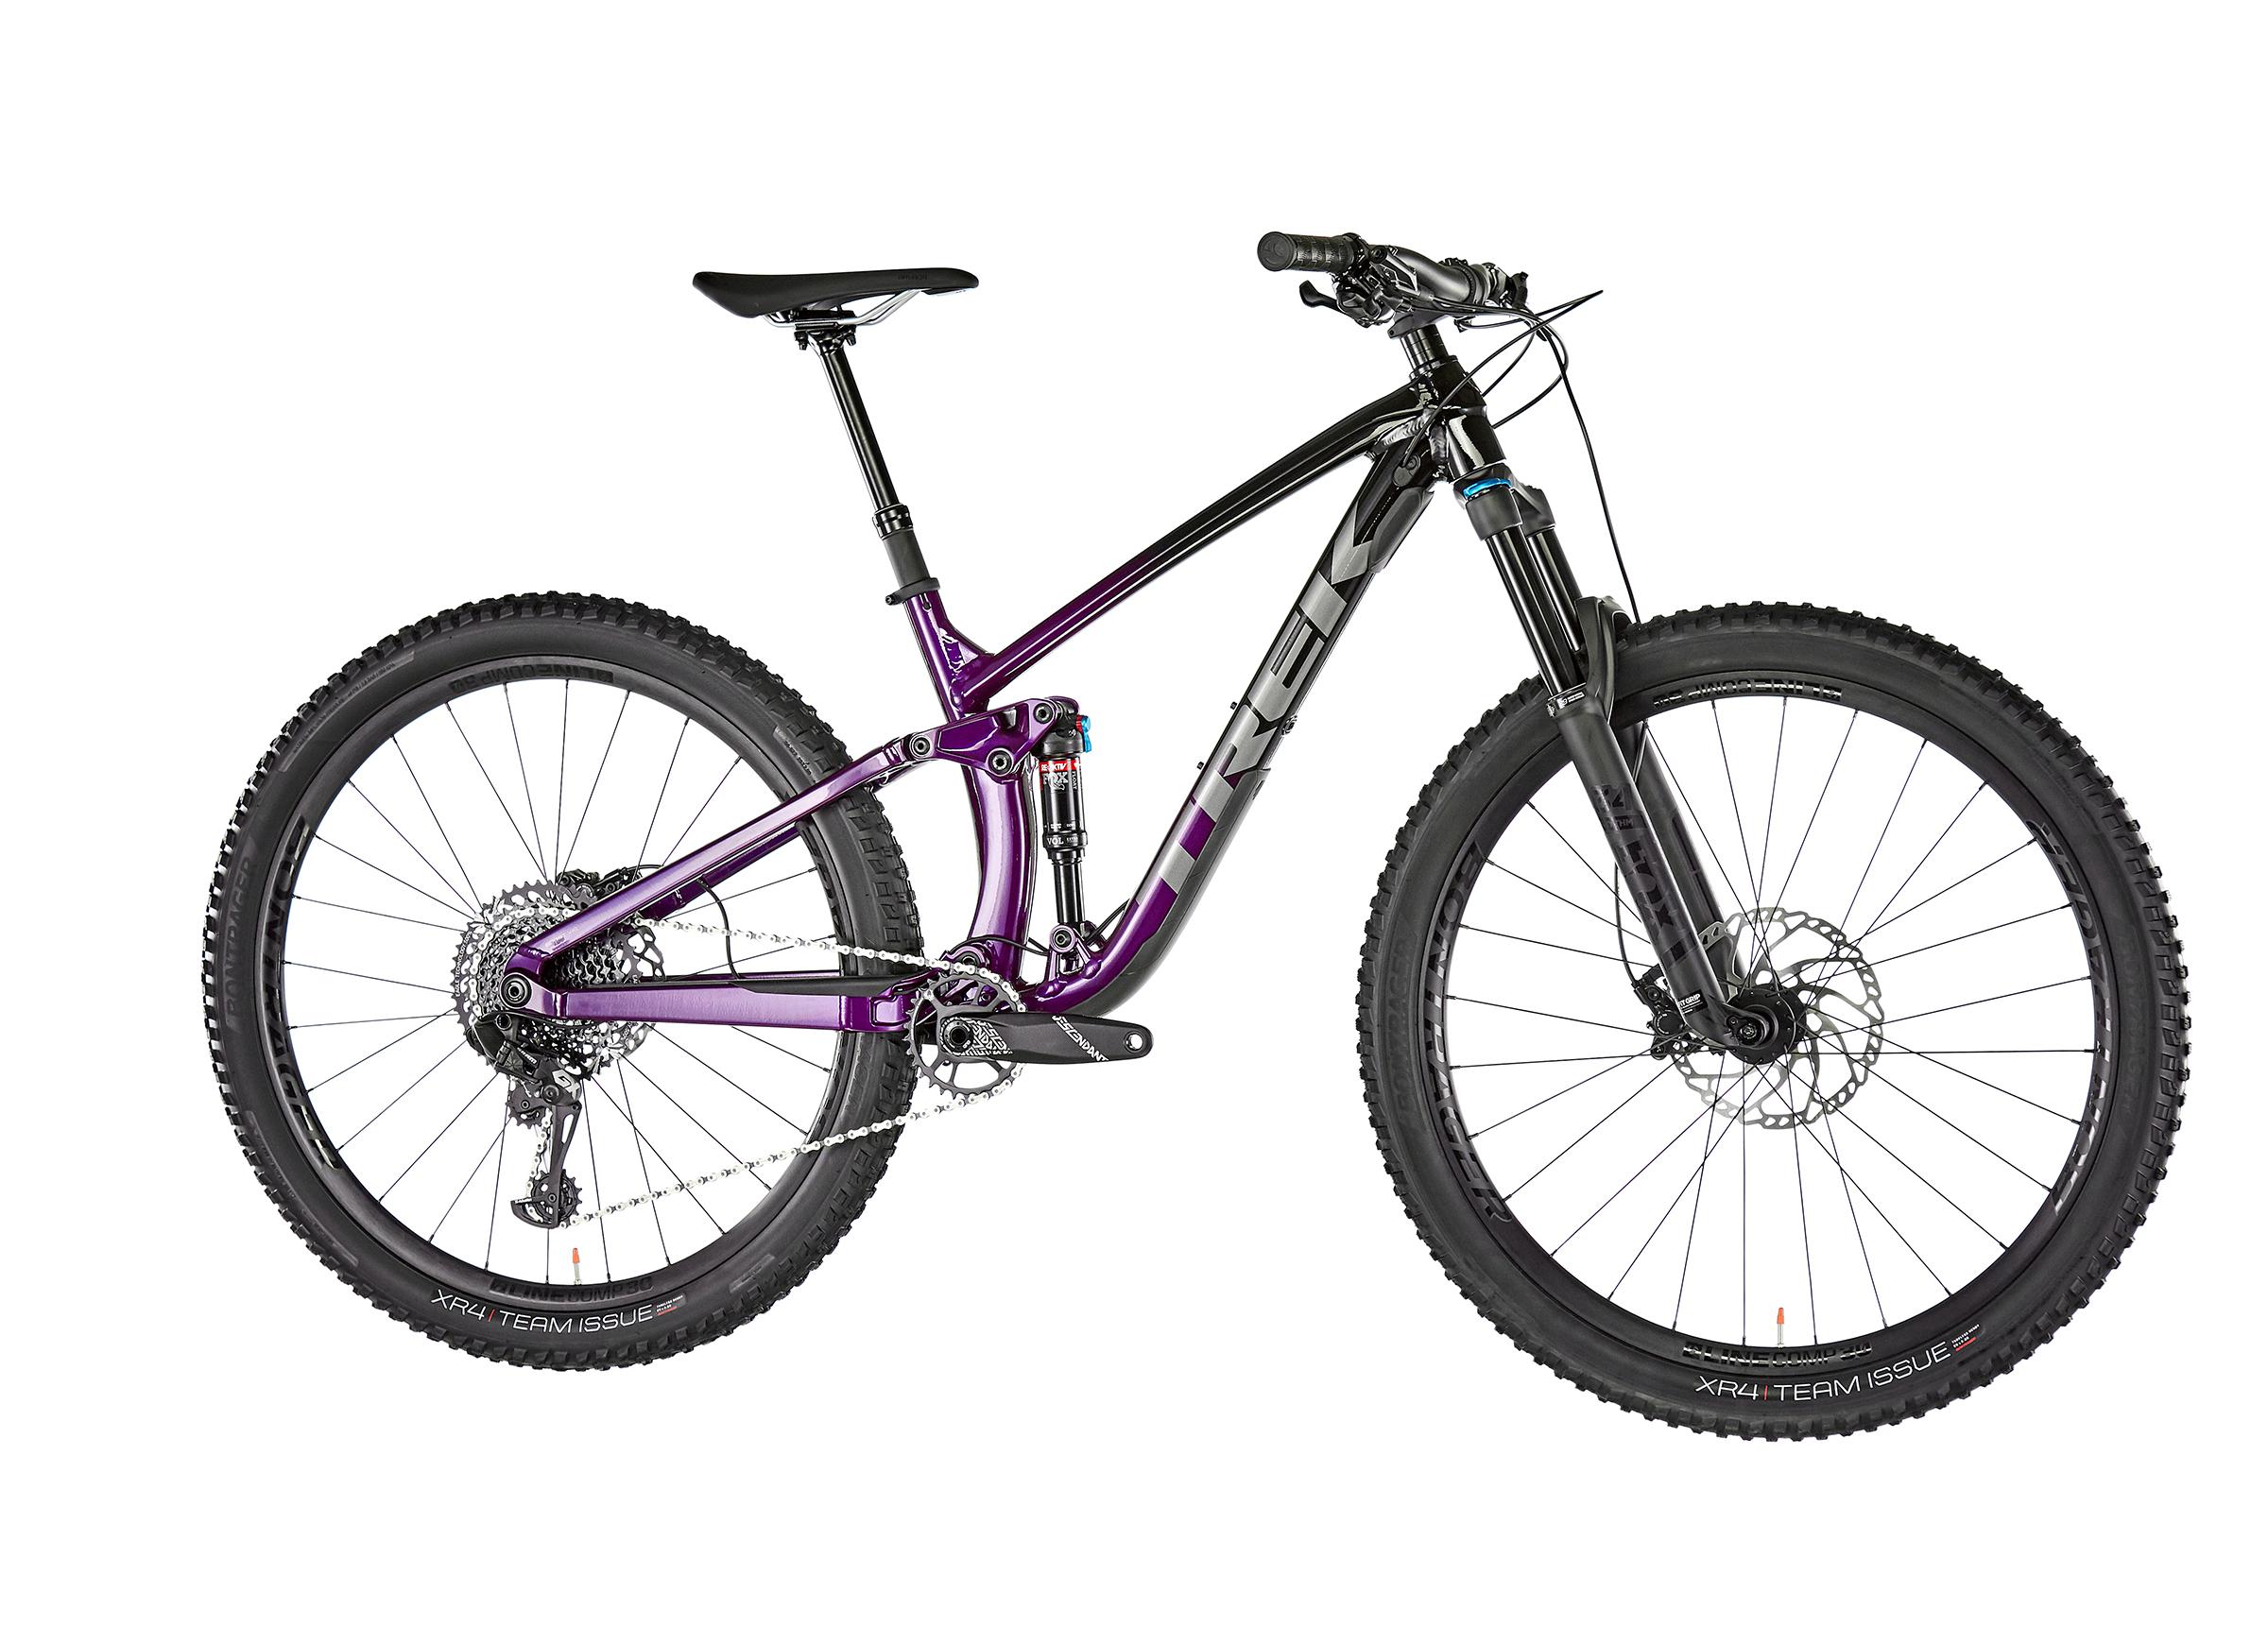 Trek Fuel EX 8 Eagle trek black/purple lotus